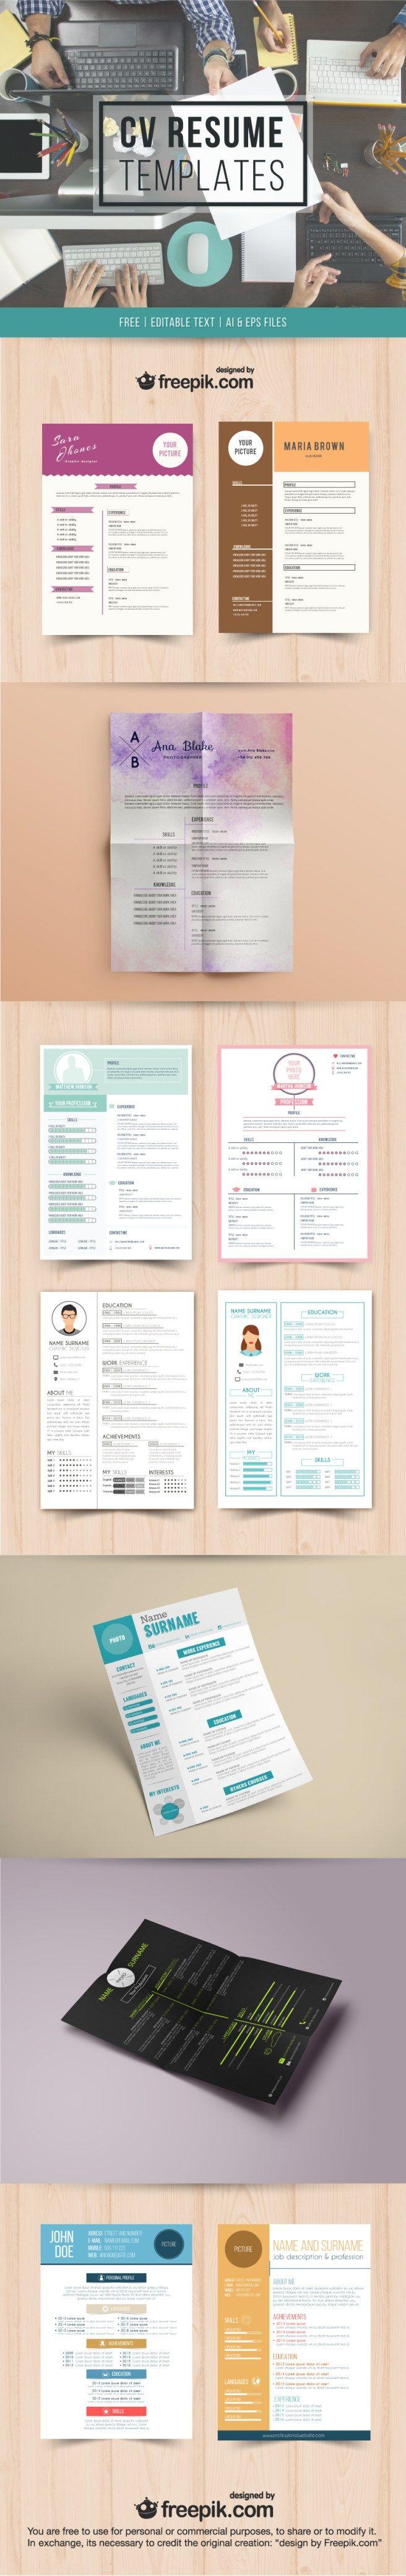 18 best Curriculos artes images on Pinterest | Resume, Resume design ...